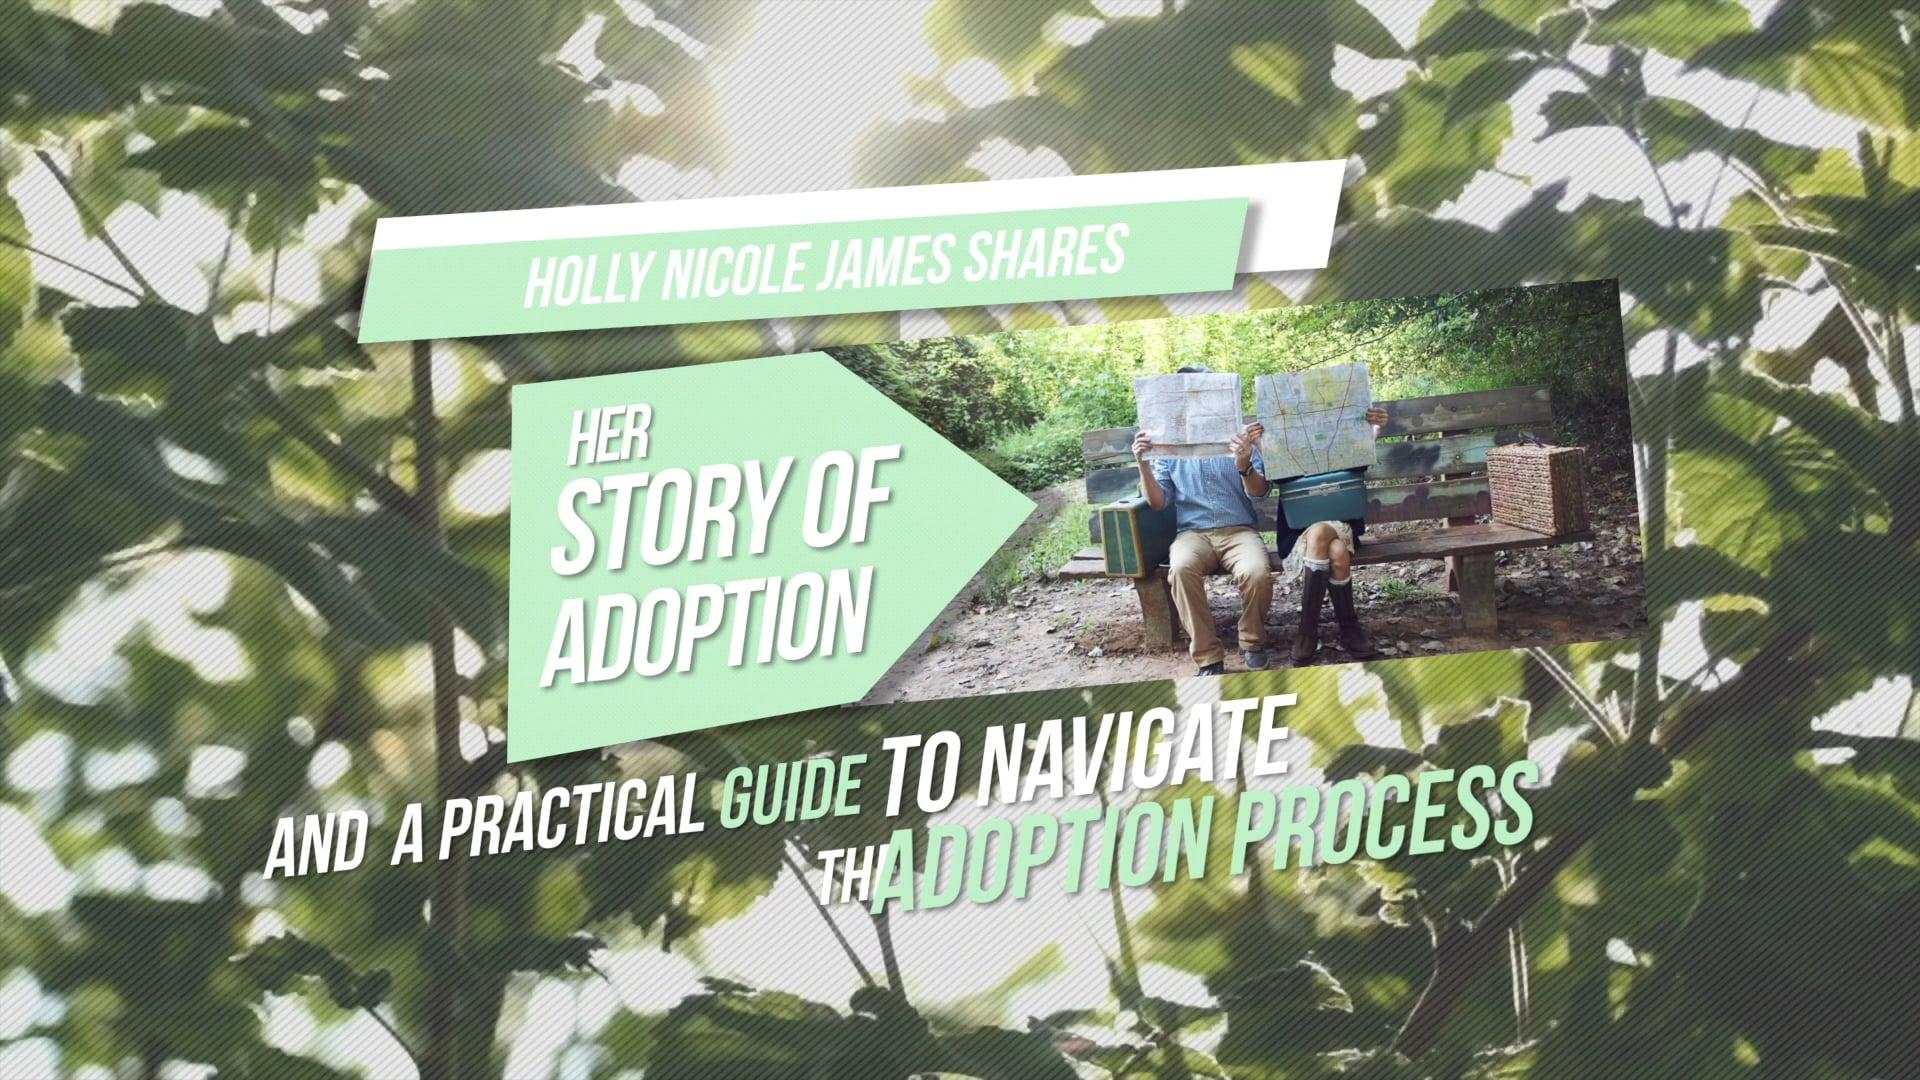 Adoption Adventure Travel Guide Trailer